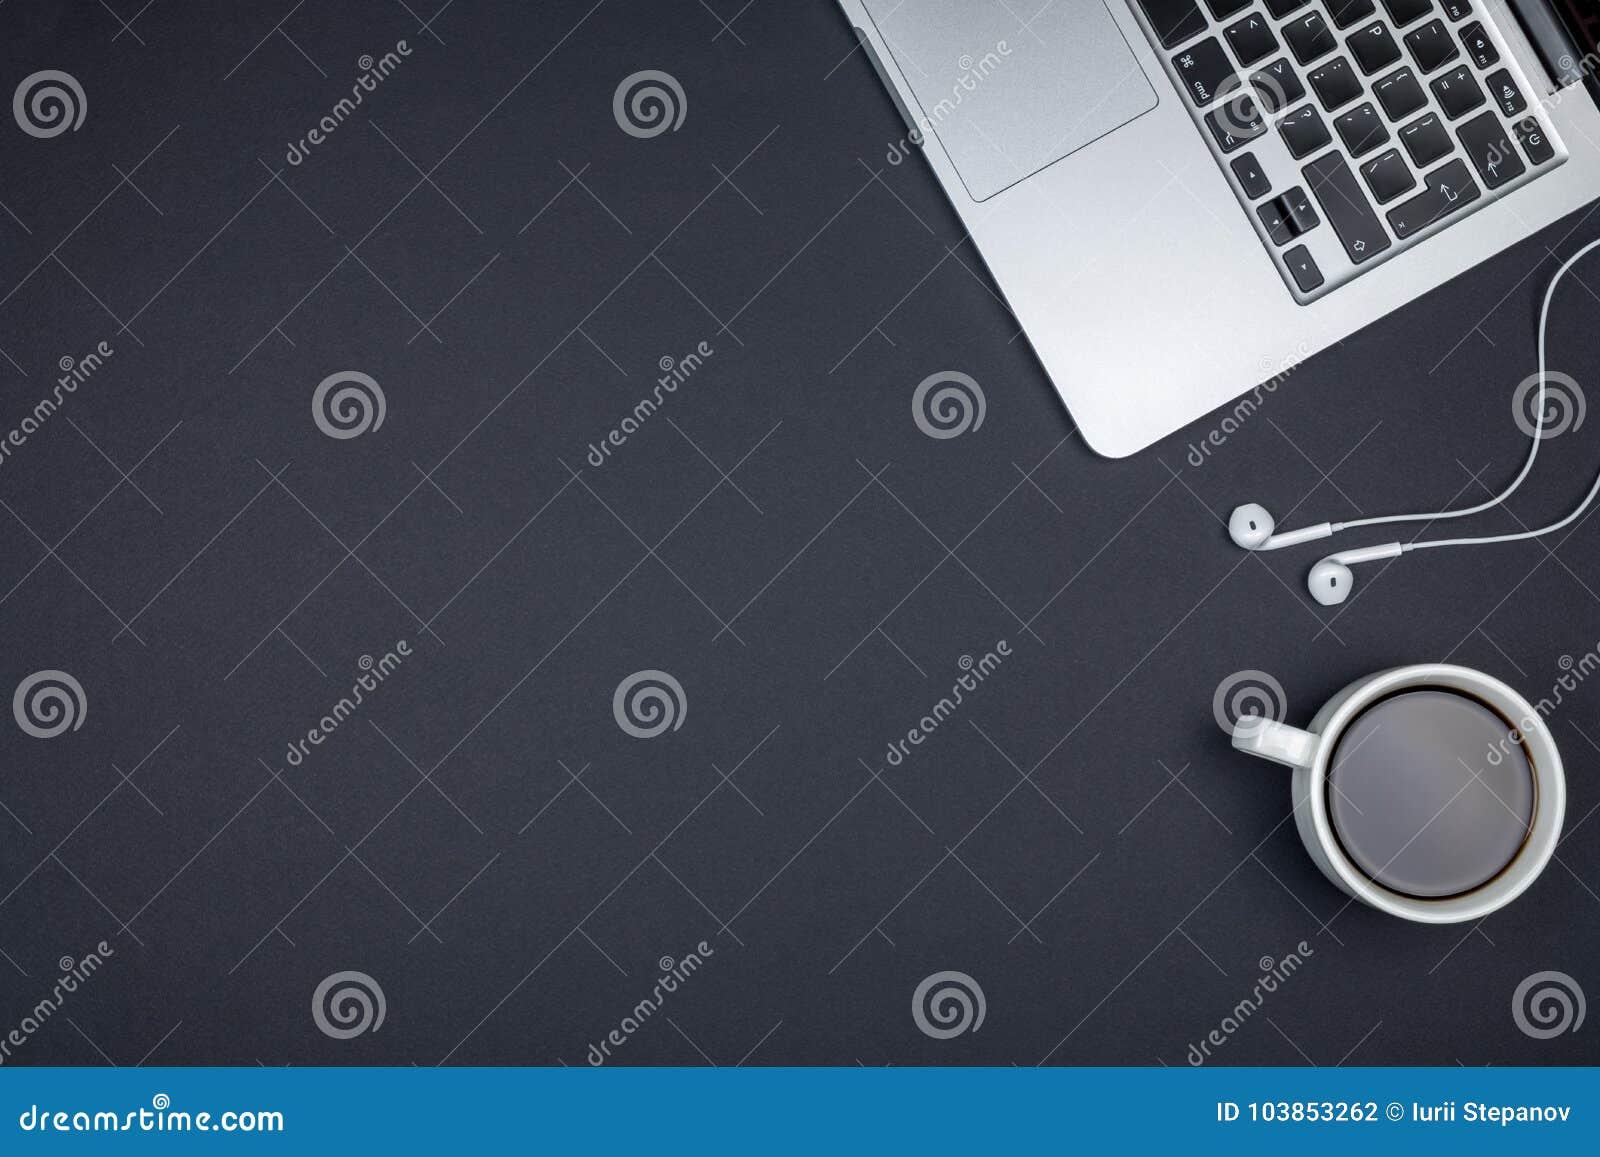 Minsta inrikesdepartementetskrivbord Top beskådar skjutit